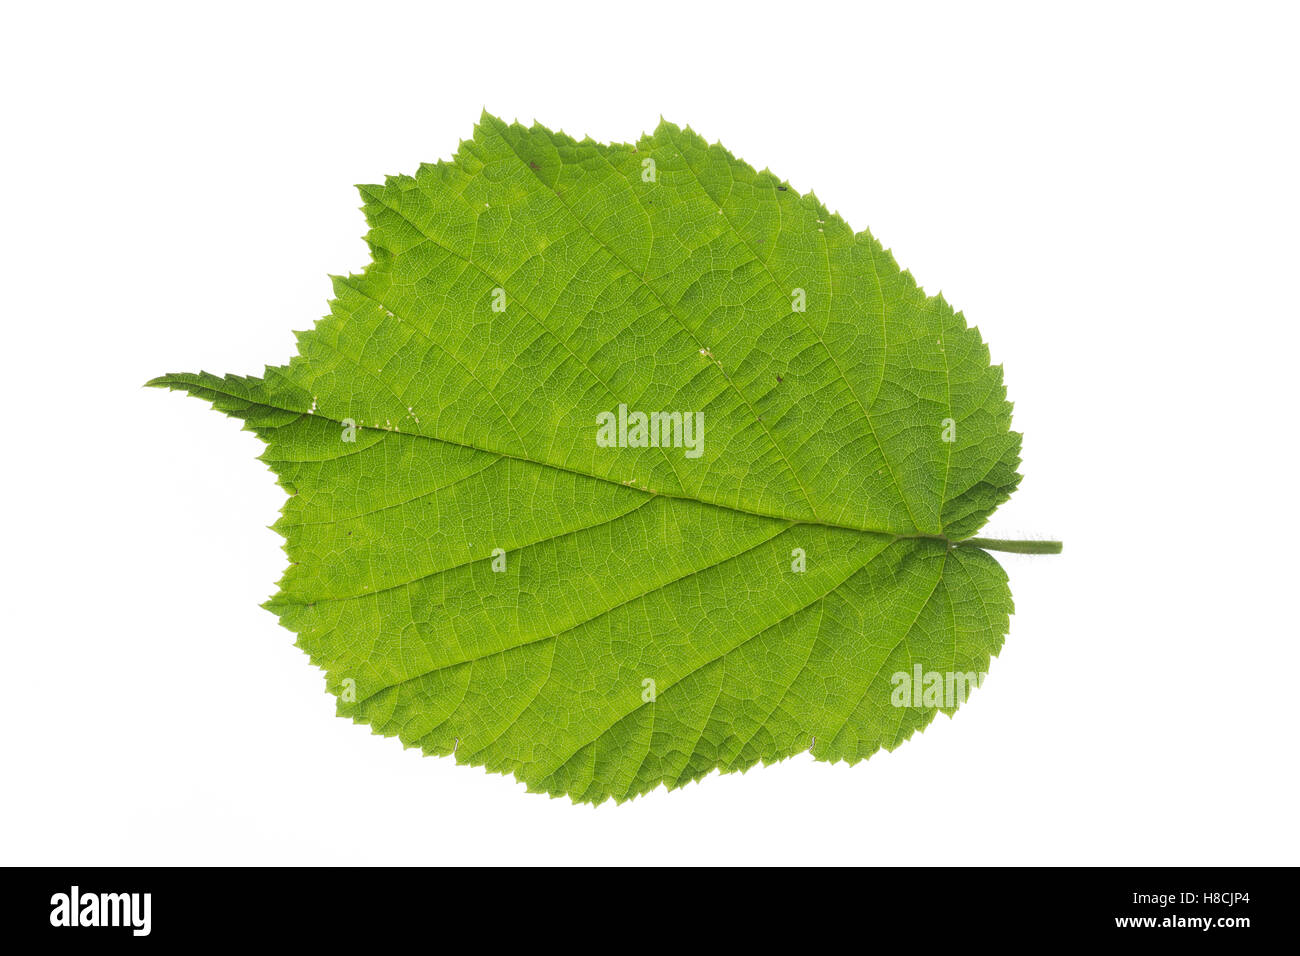 Gewöhnliche Hasel, Haselnuß, Haselnuss, Corylus avellana, Cob, Hazel, Coudrier, Noisetier commun. Blatt, - Stock Image